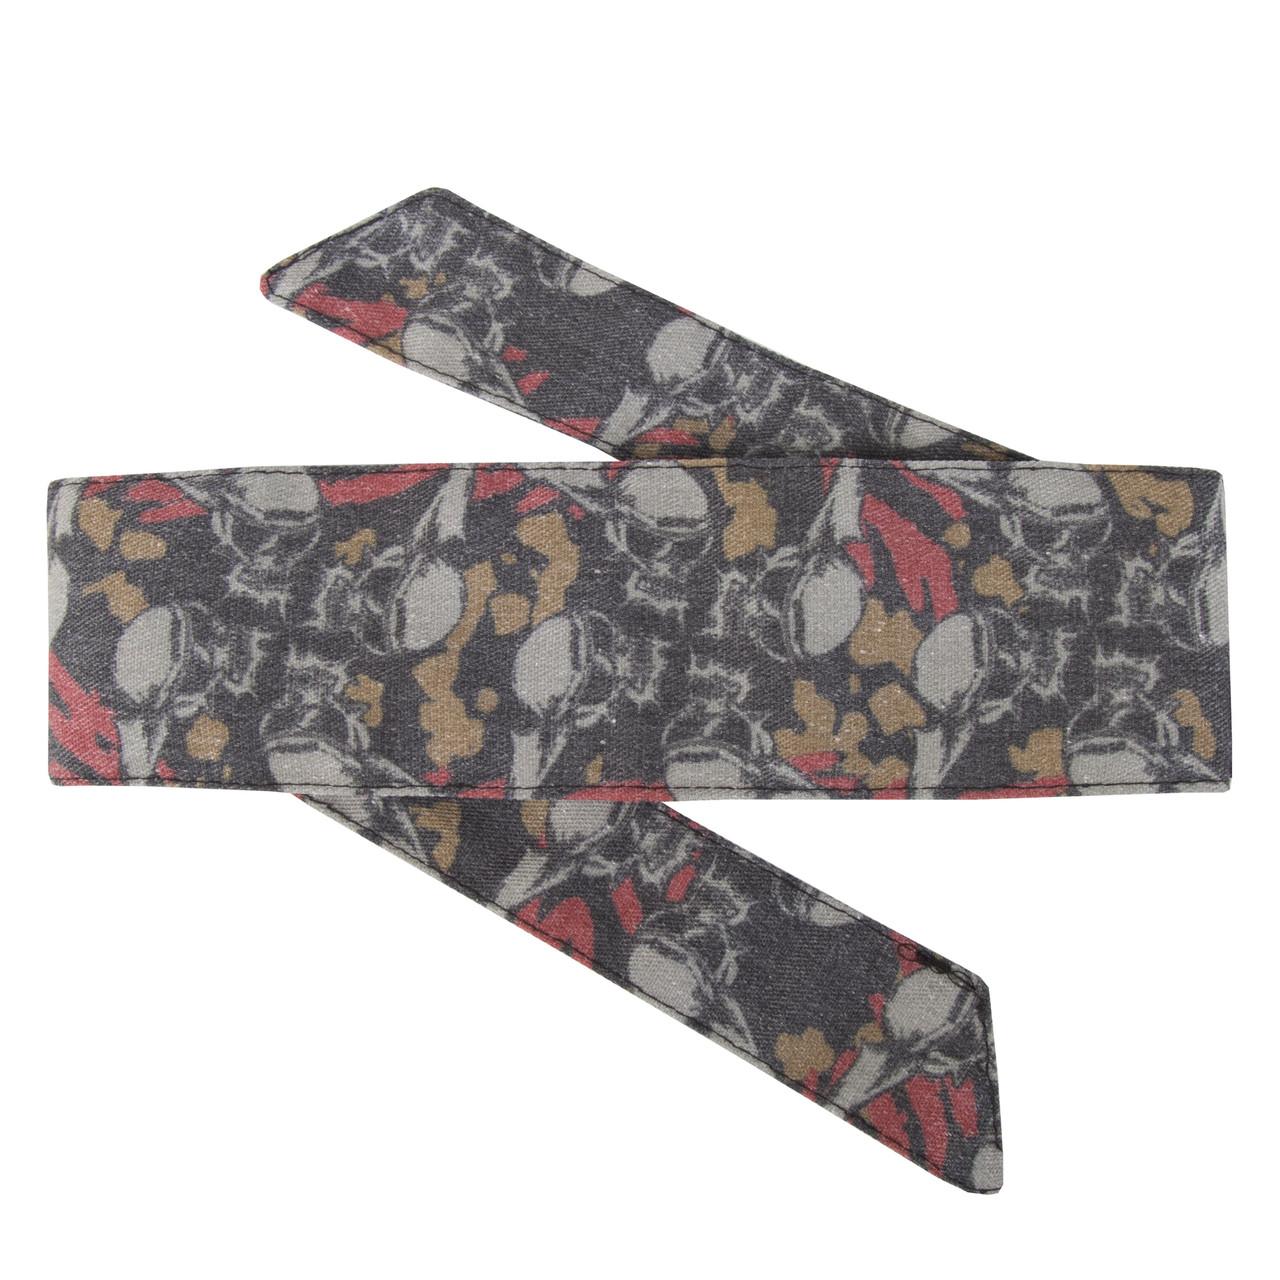 HK Army Headband HSTL Skulls Tan/Red